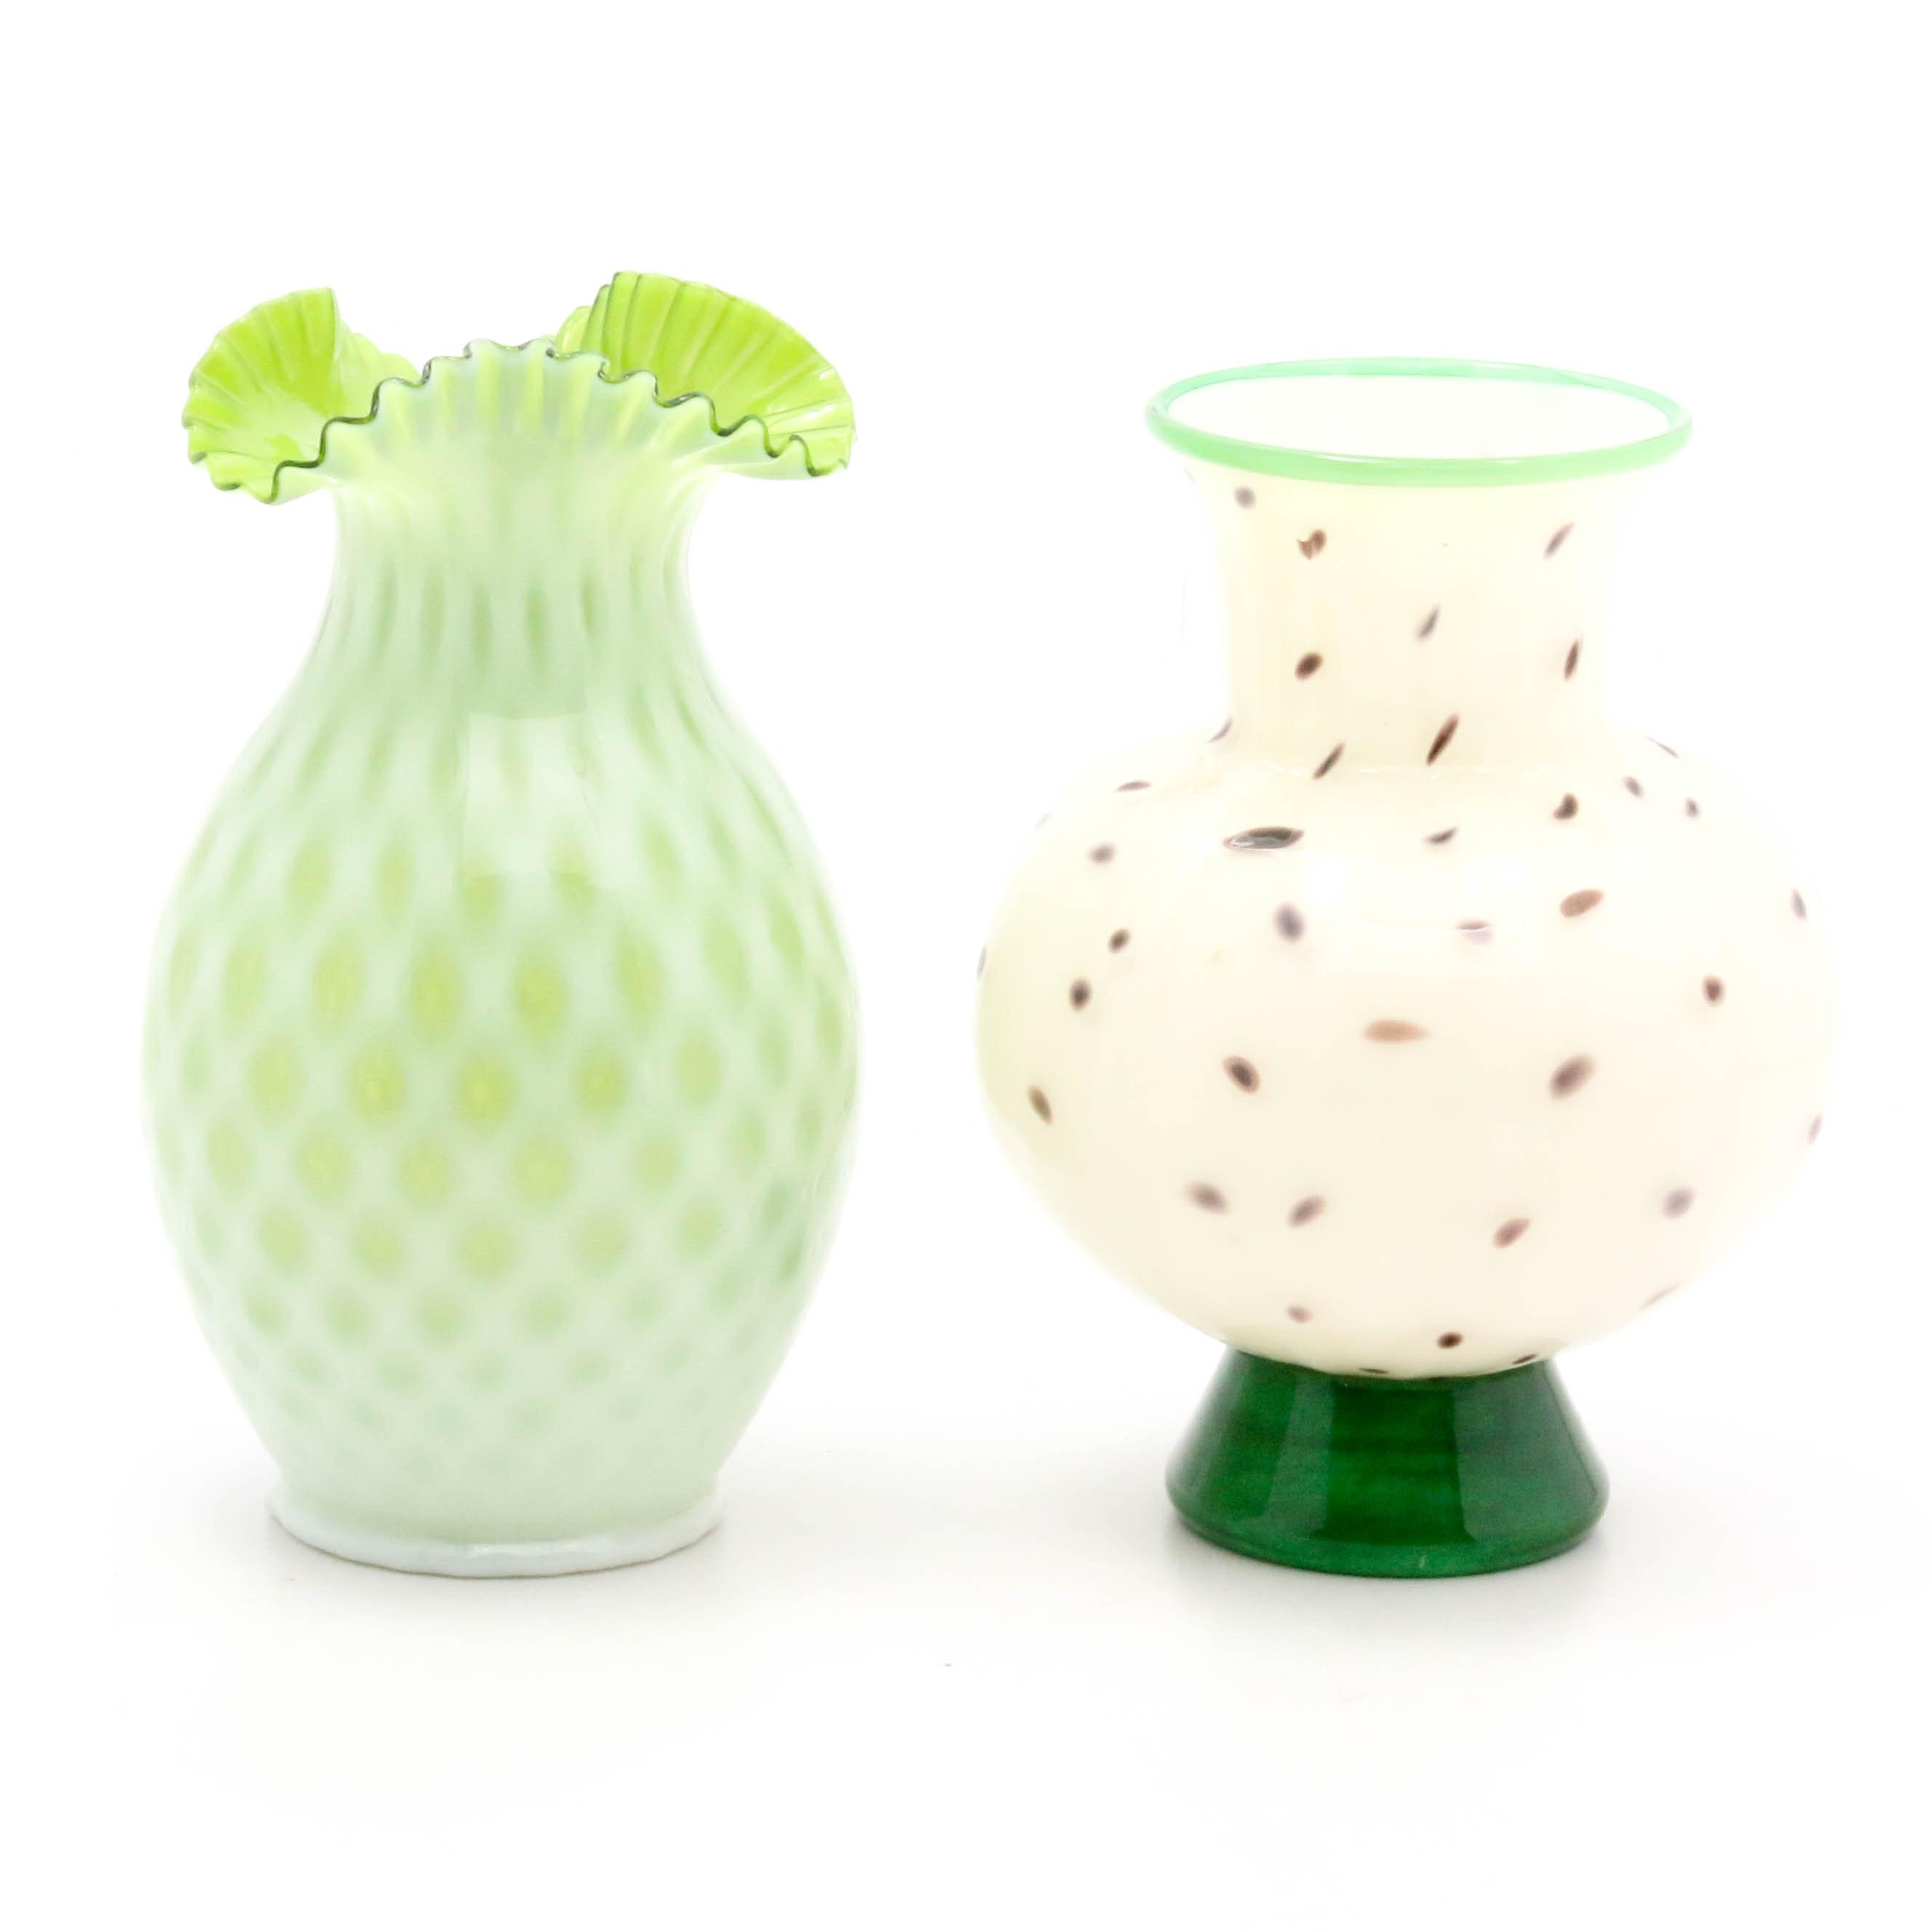 Vintage Hand-Blown Glass Vases